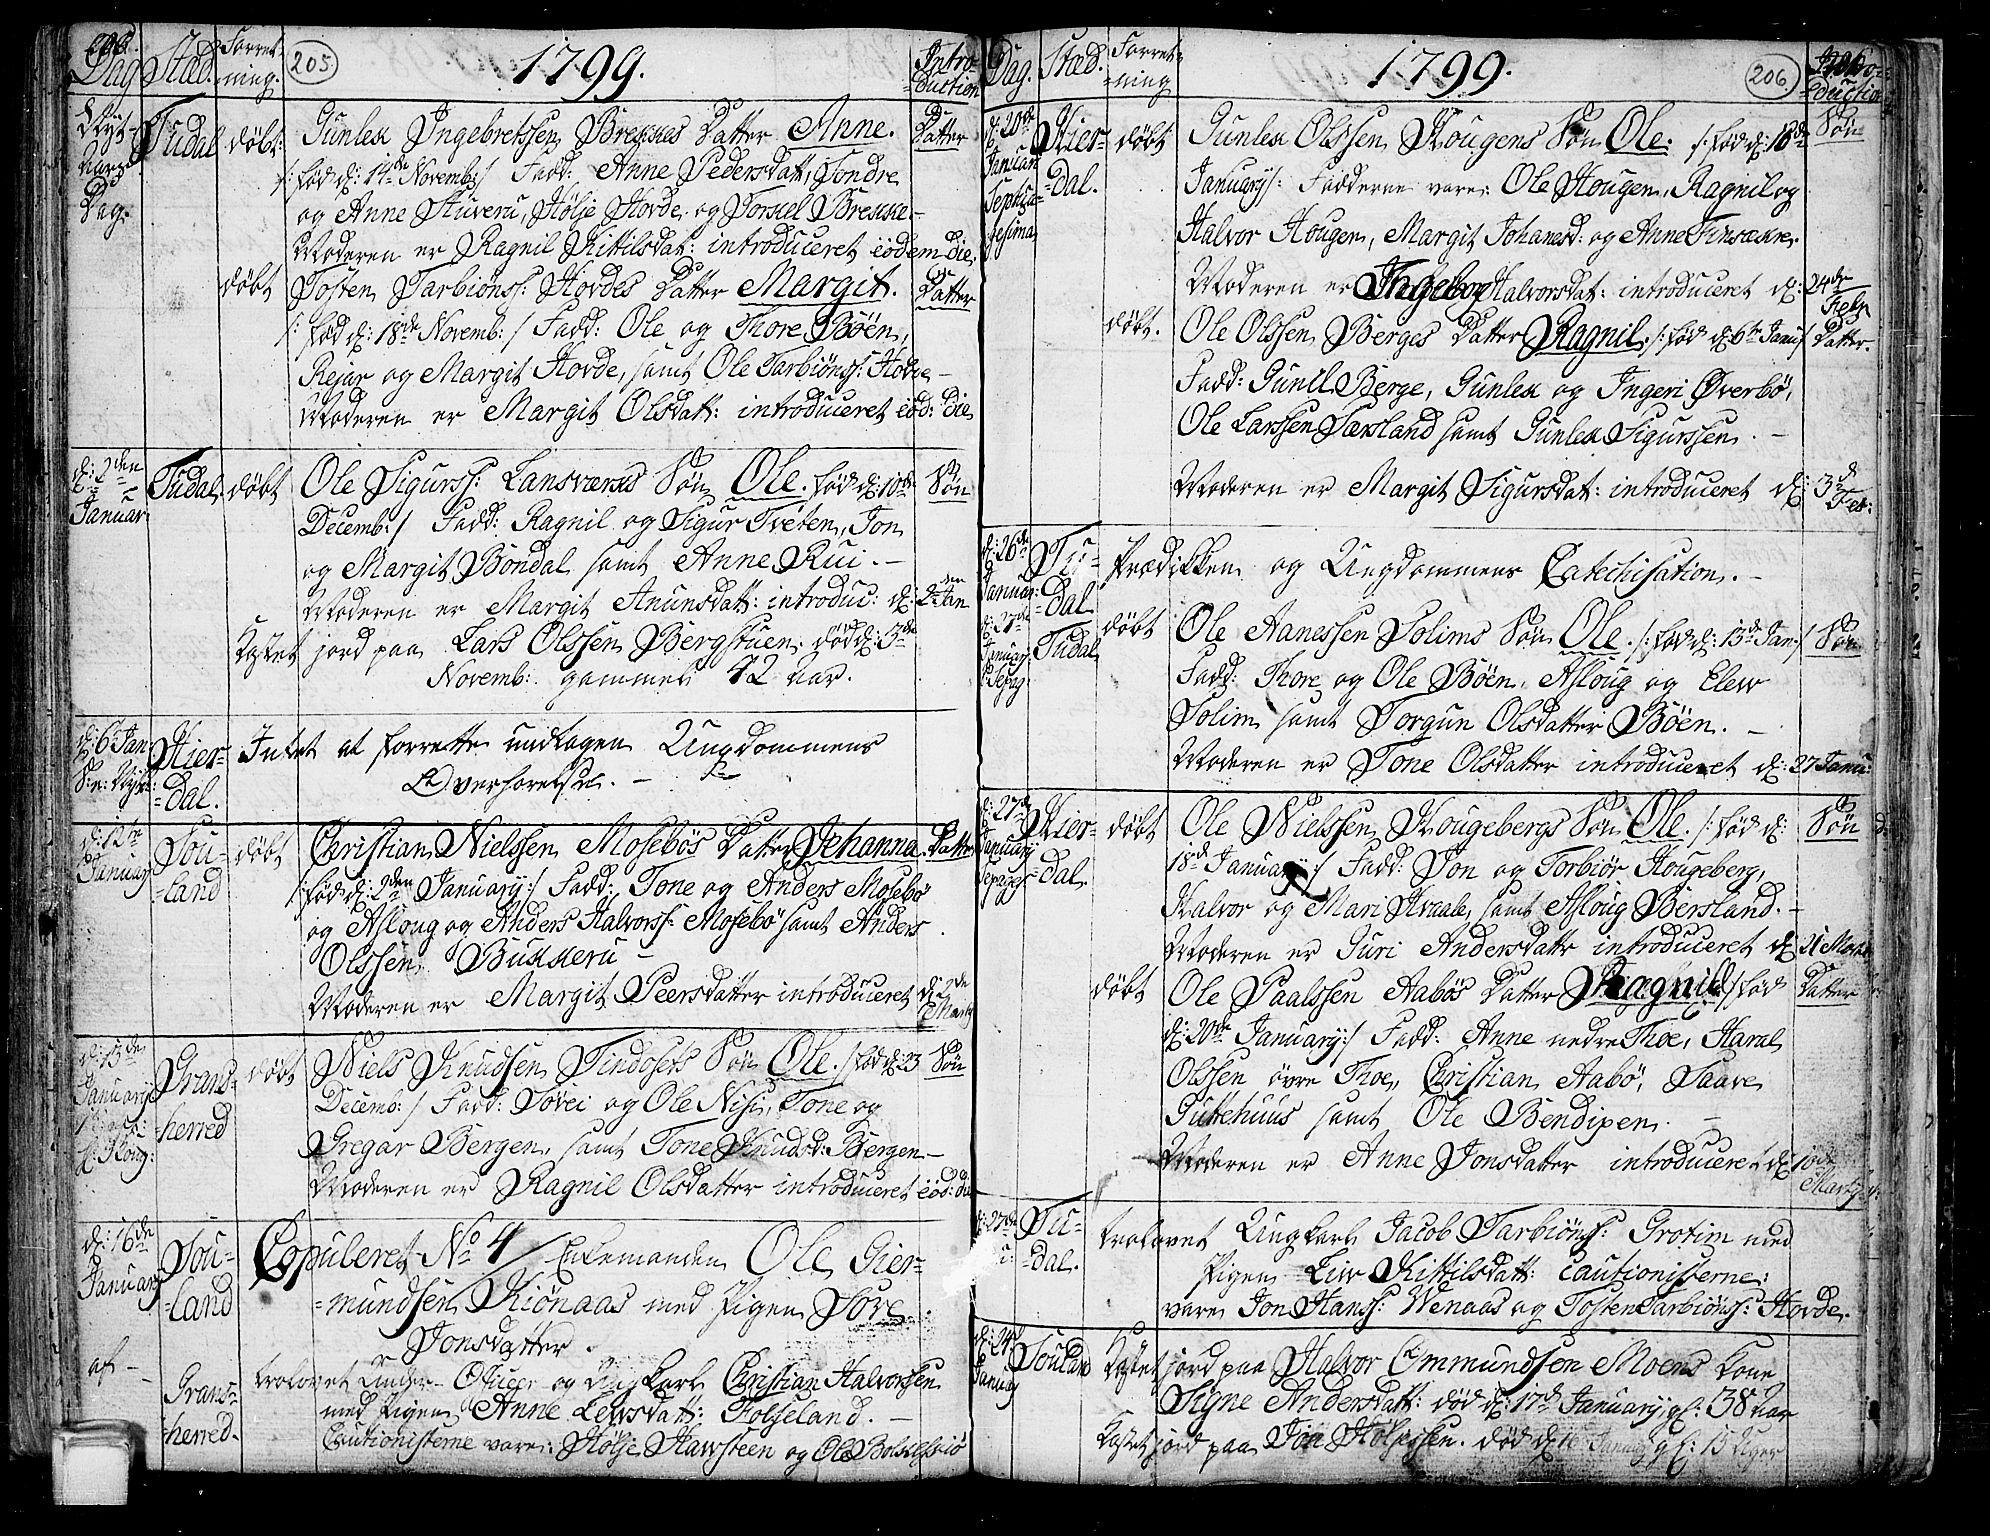 SAKO, Hjartdal kirkebøker, F/Fa/L0005: Ministerialbok nr. I 5, 1776-1801, s. 205-206